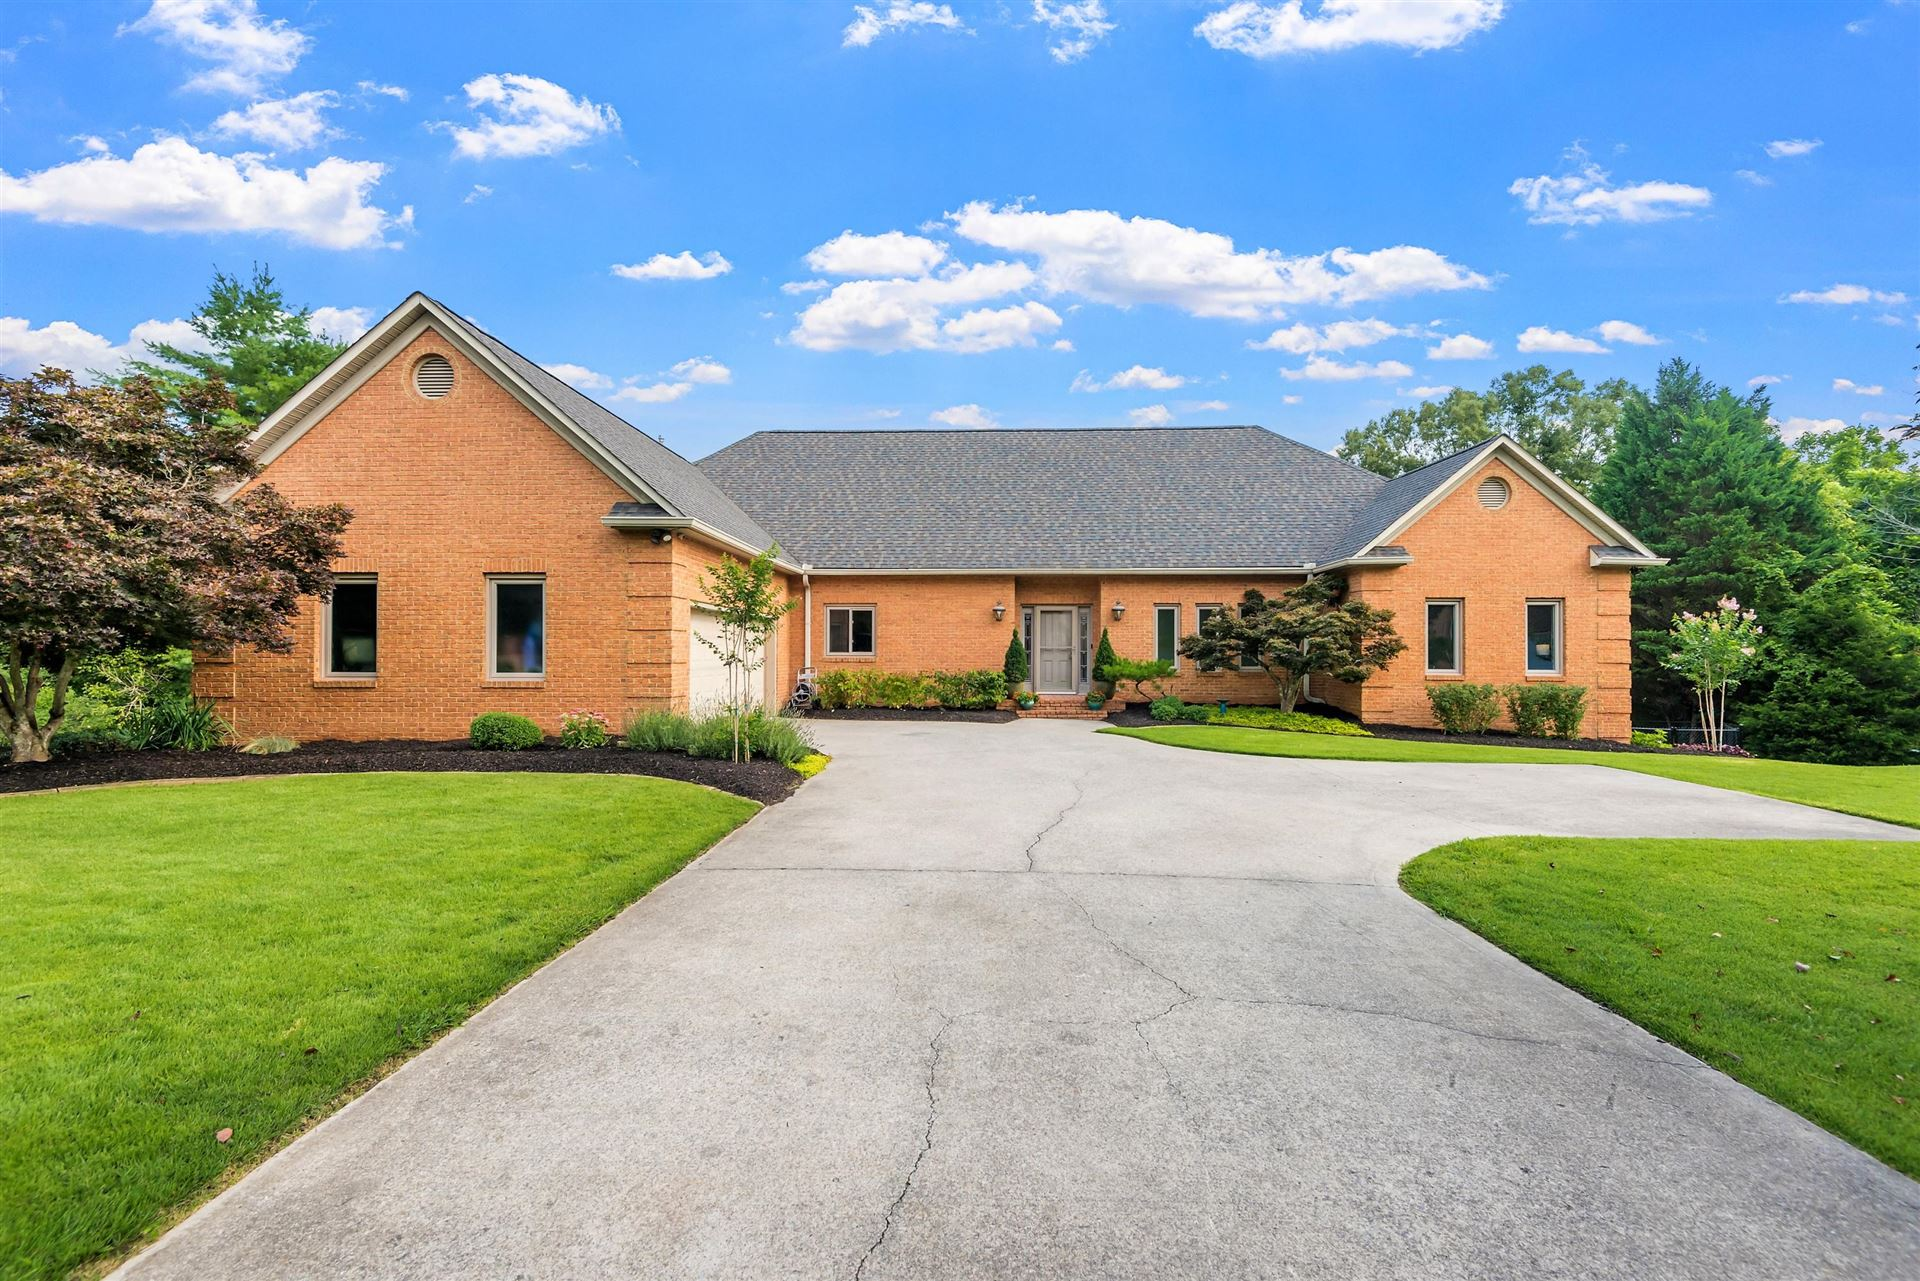 Photo of 17 Radcliff Terrace, Oak Ridge, TN 37830 (MLS # 1161074)